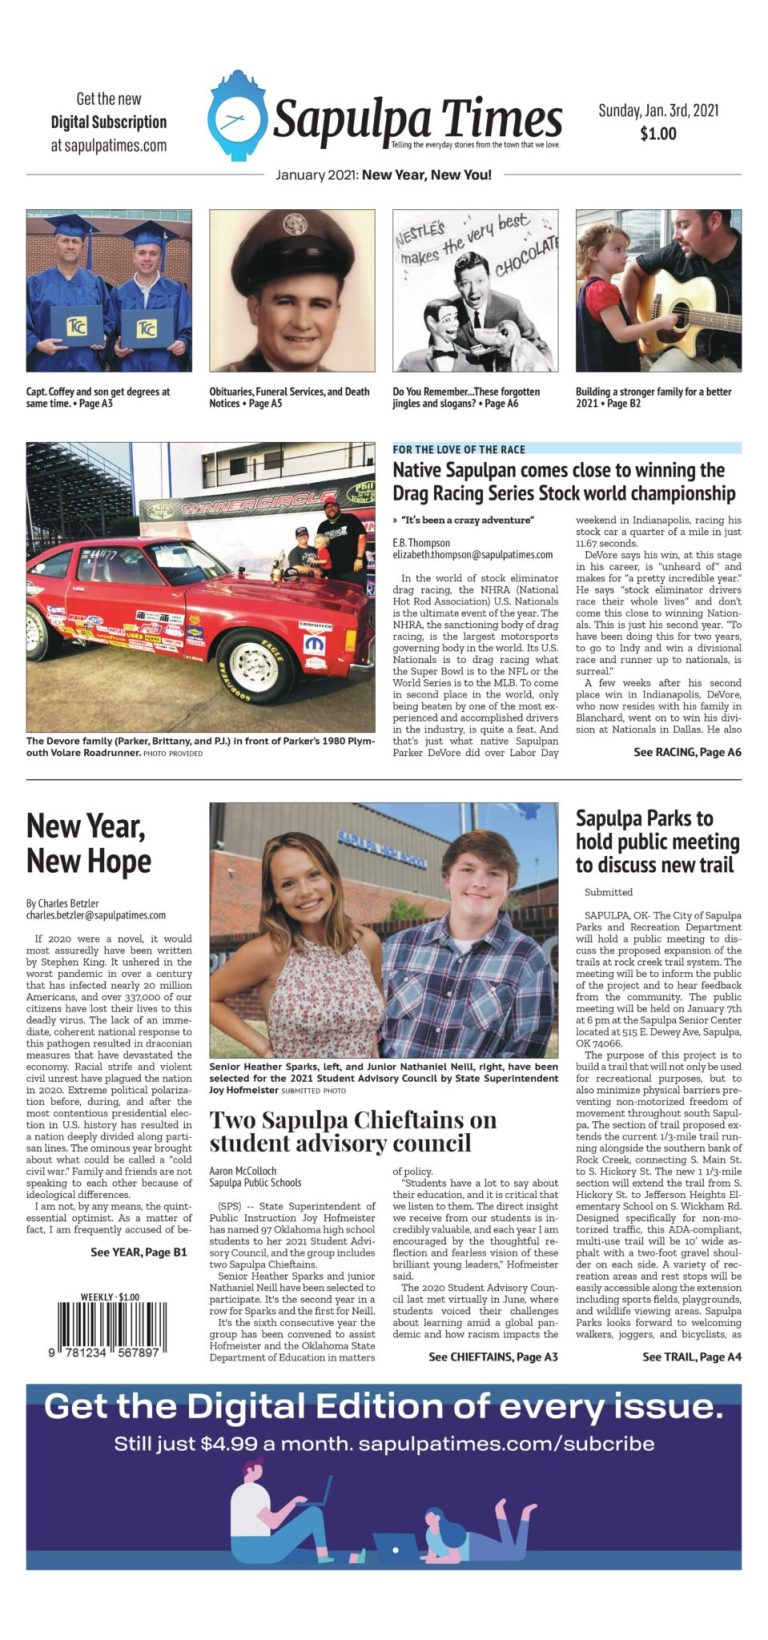 Sapulpa Times Digital Edition 01/03/2021